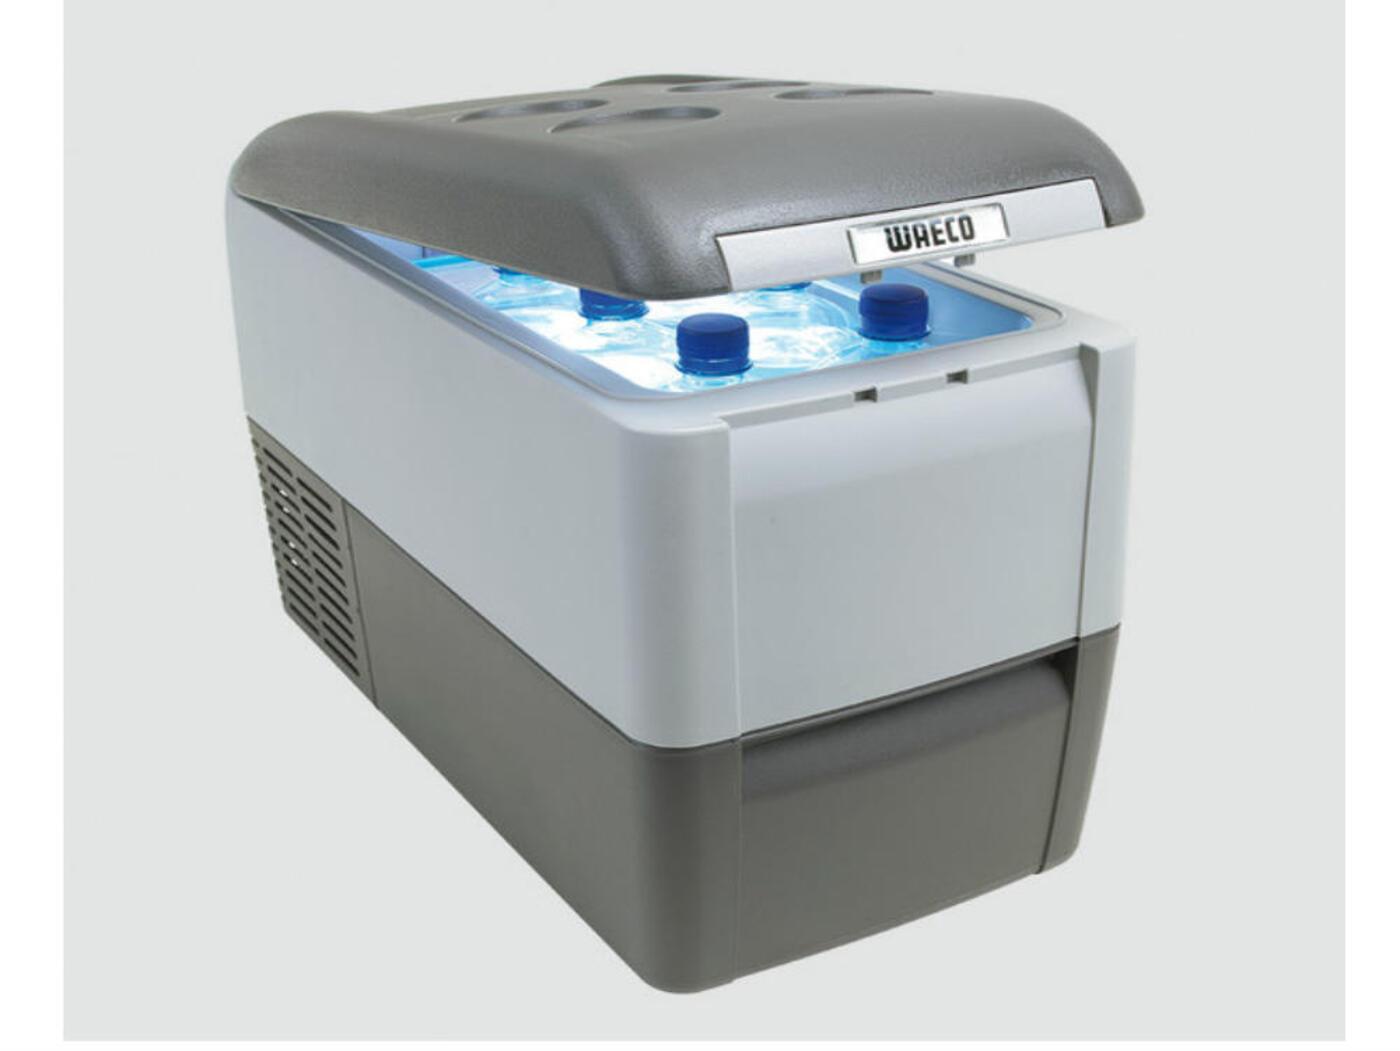 Waeco Cdf 25 Portable Fridge Freezer Homestead Caravans